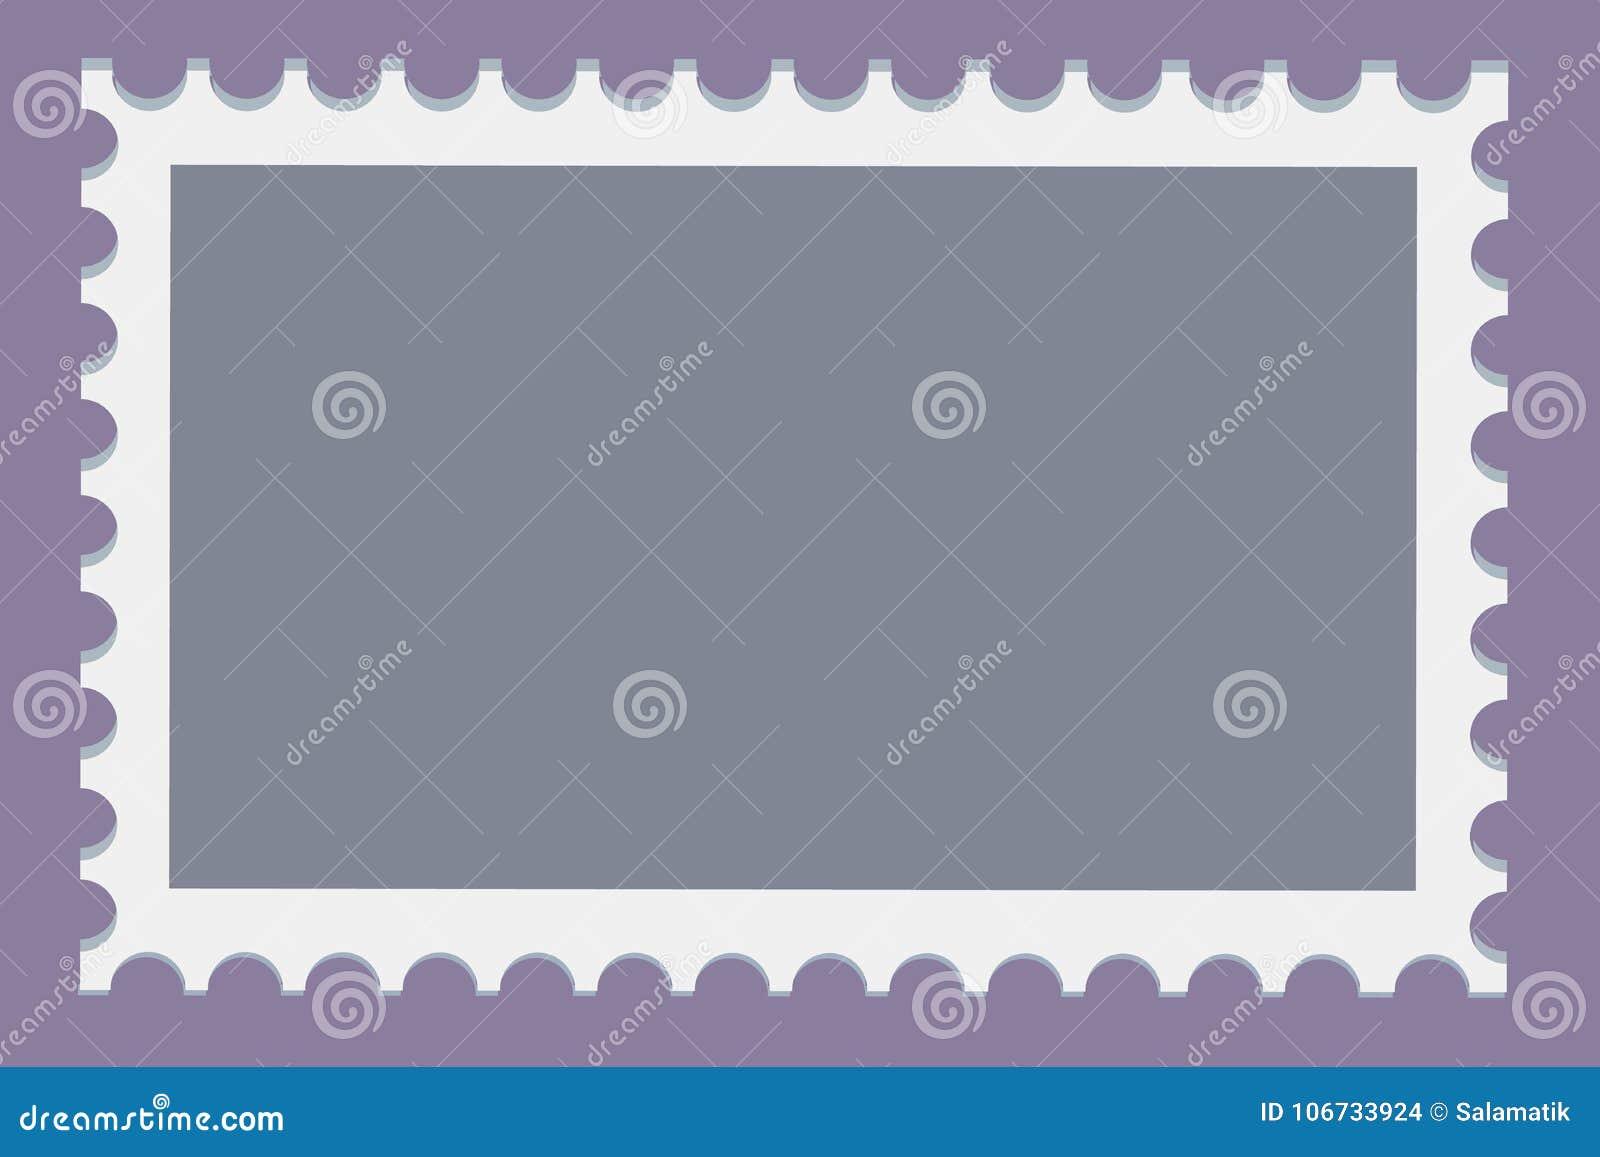 Blank postage stamps template set on dark background. Rectangle postage stamps for envelopes, postcards. Vector